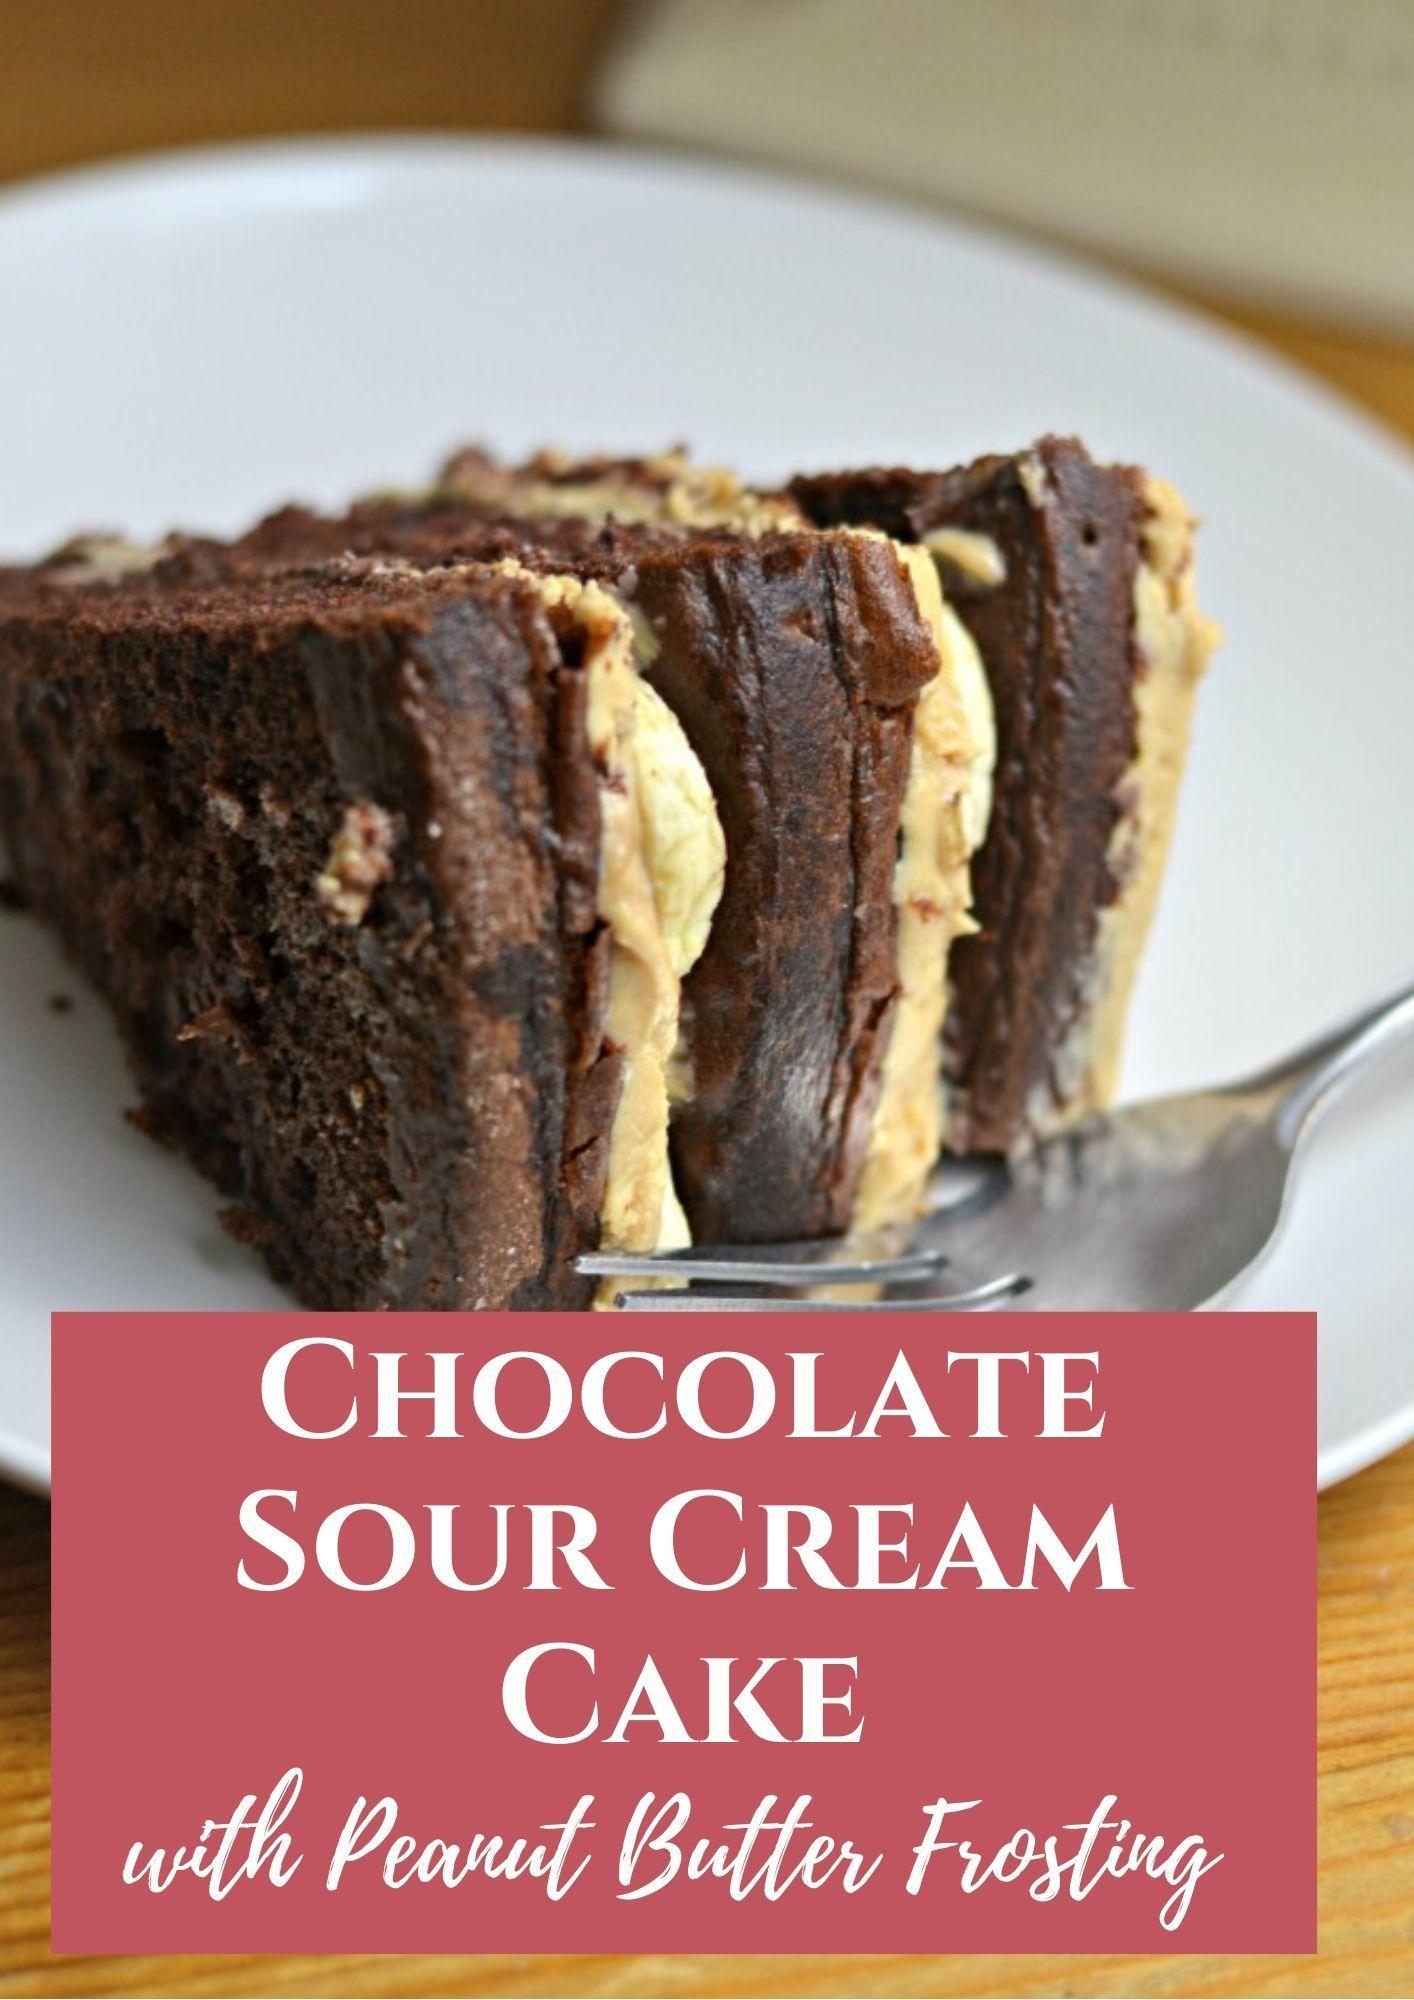 Chocolate Sour Cream Cake With Peanut Butter Frosting In 2020 Sour Cream Cake Sour Cream Chocolate Cake Cream Cake